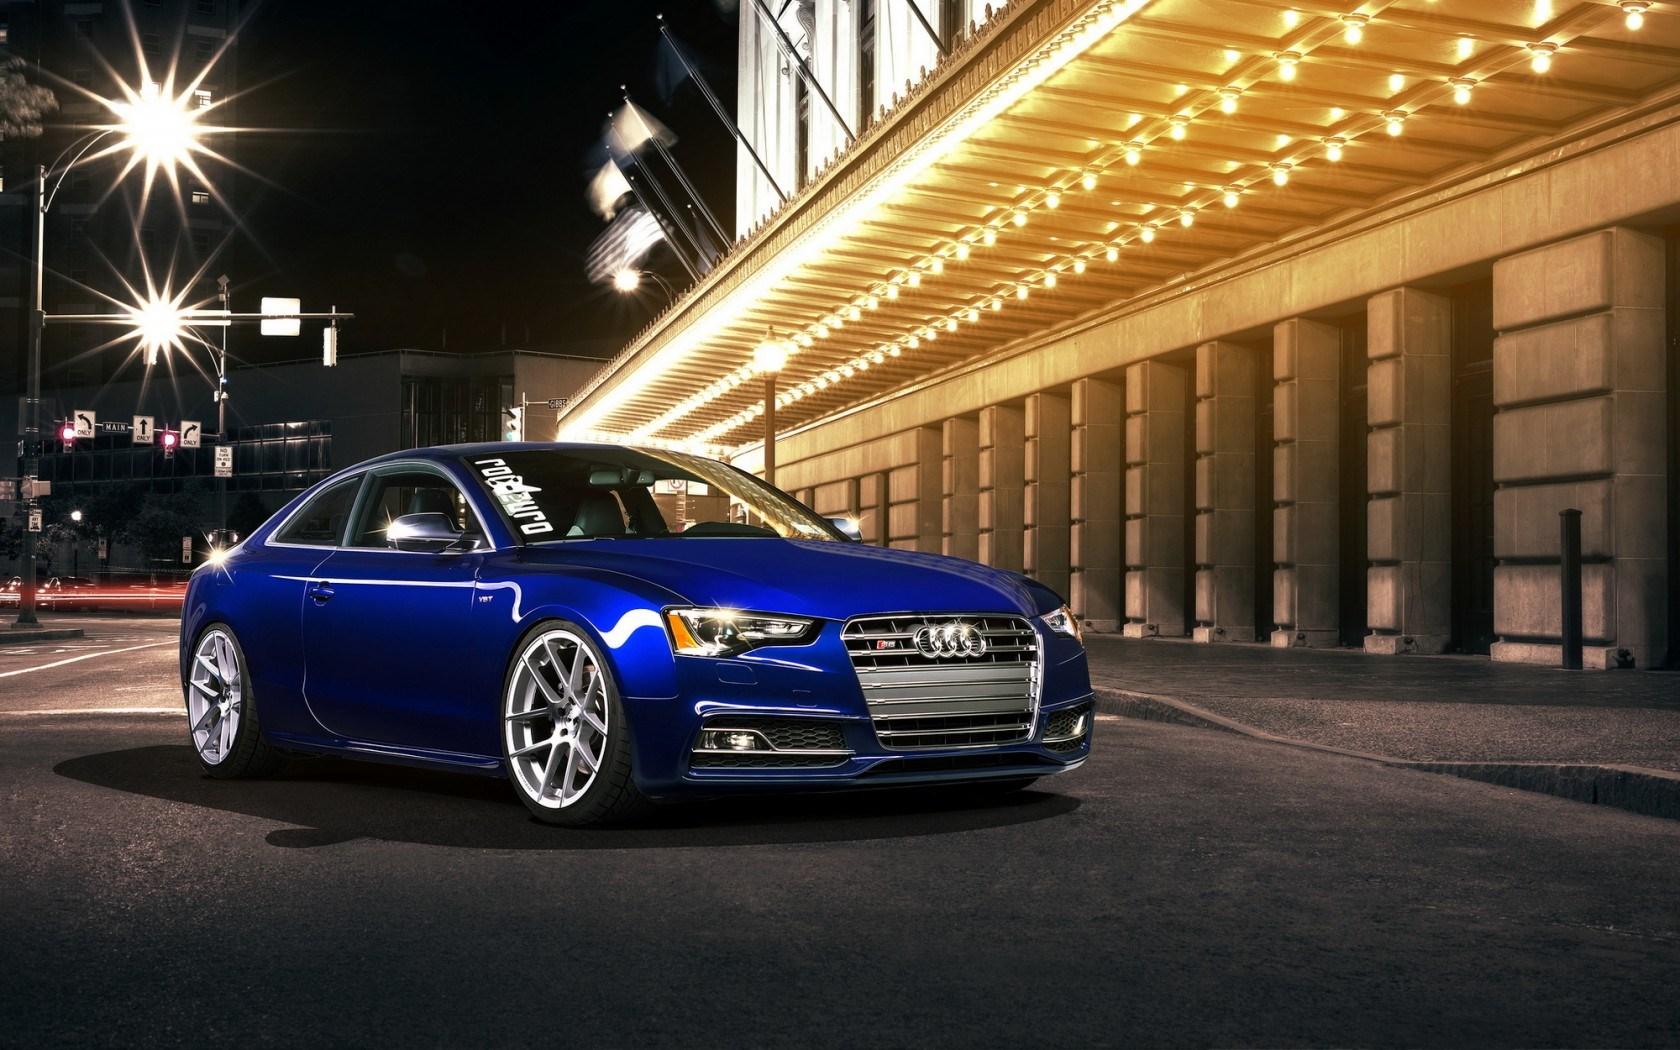 Audi S5 Coupe Tuning Street Night